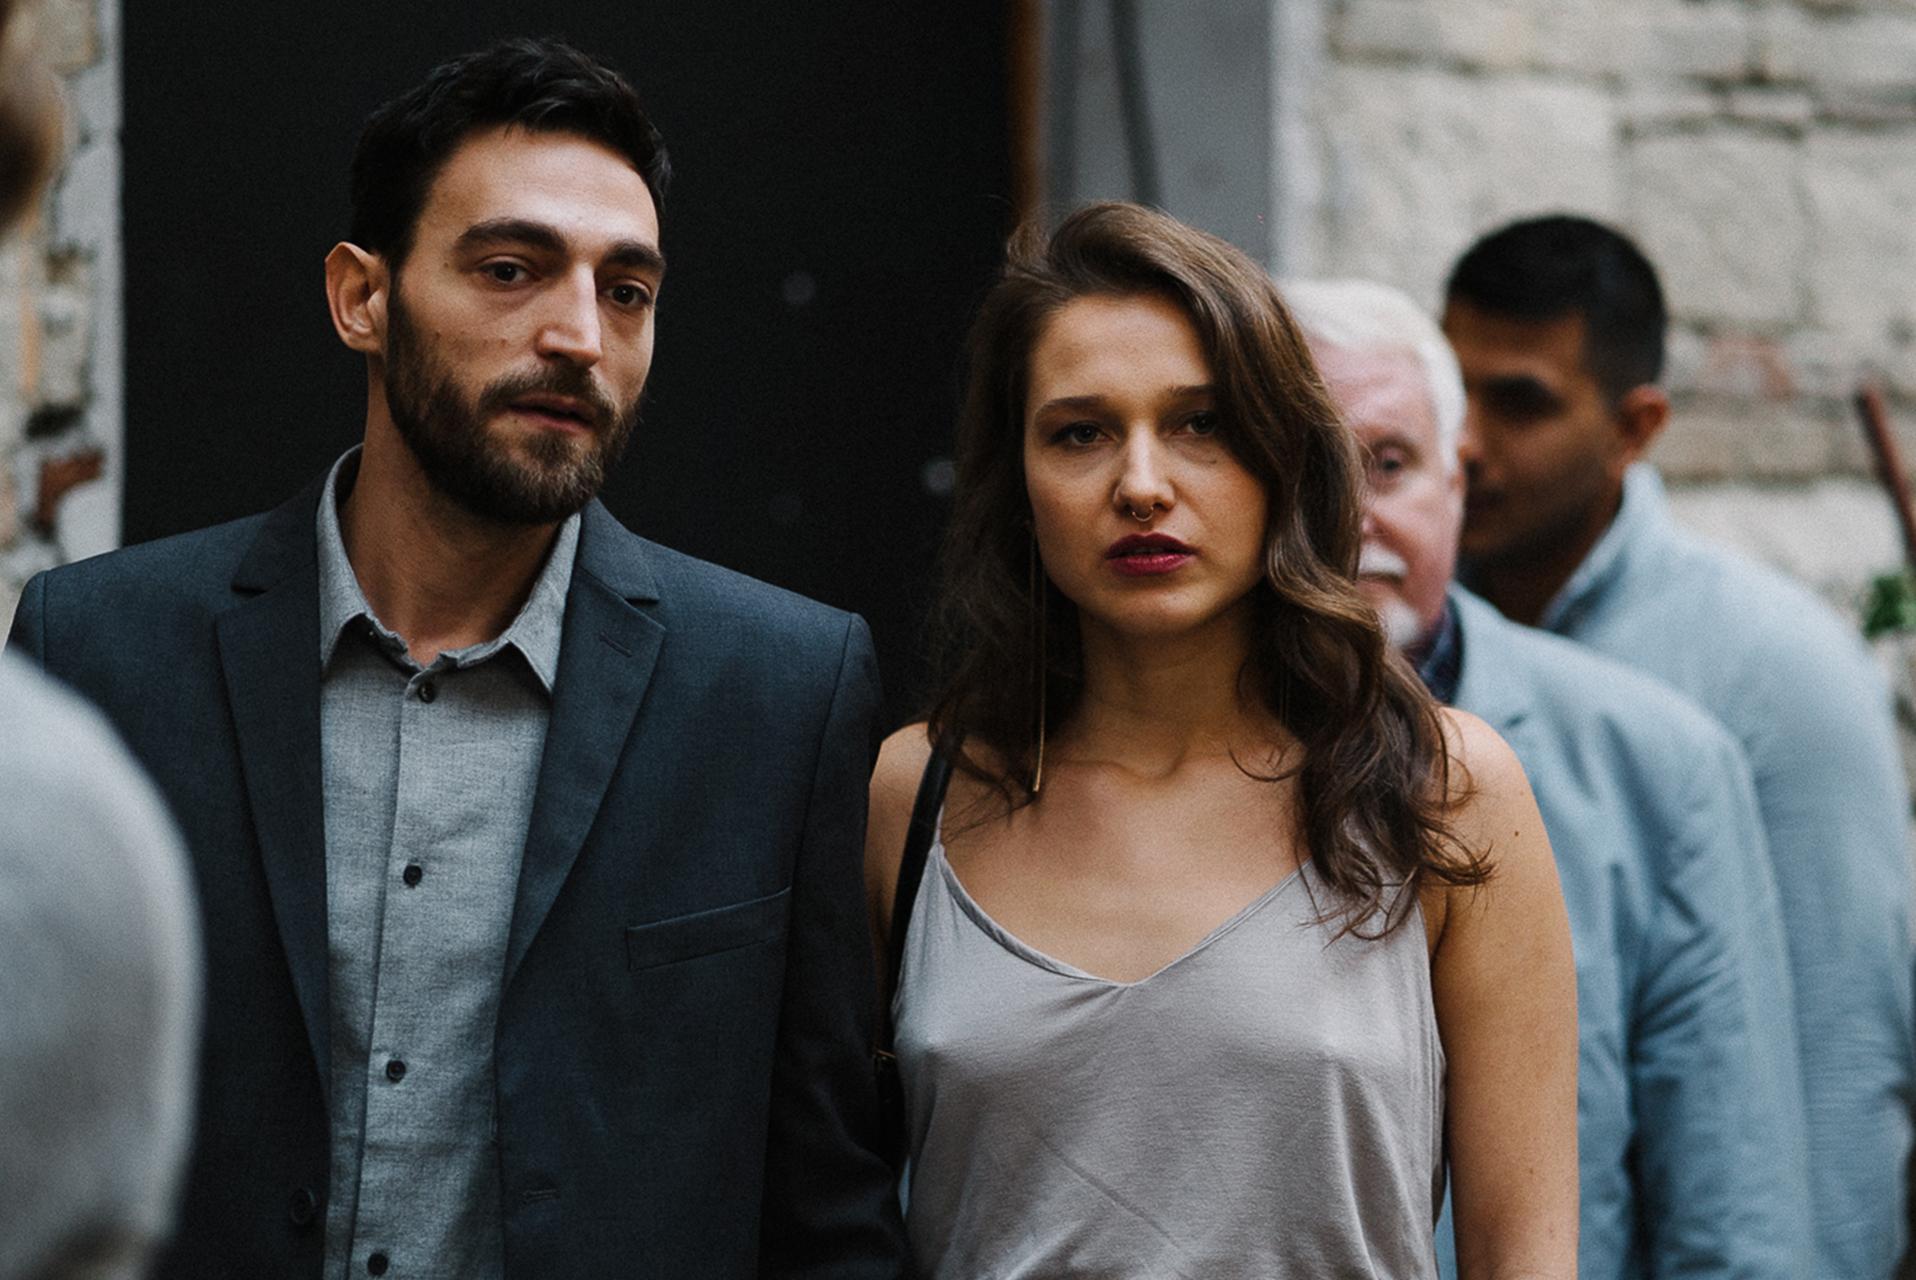 Bálint Zsigri and Andrea Waskovics in Balansz (2019)